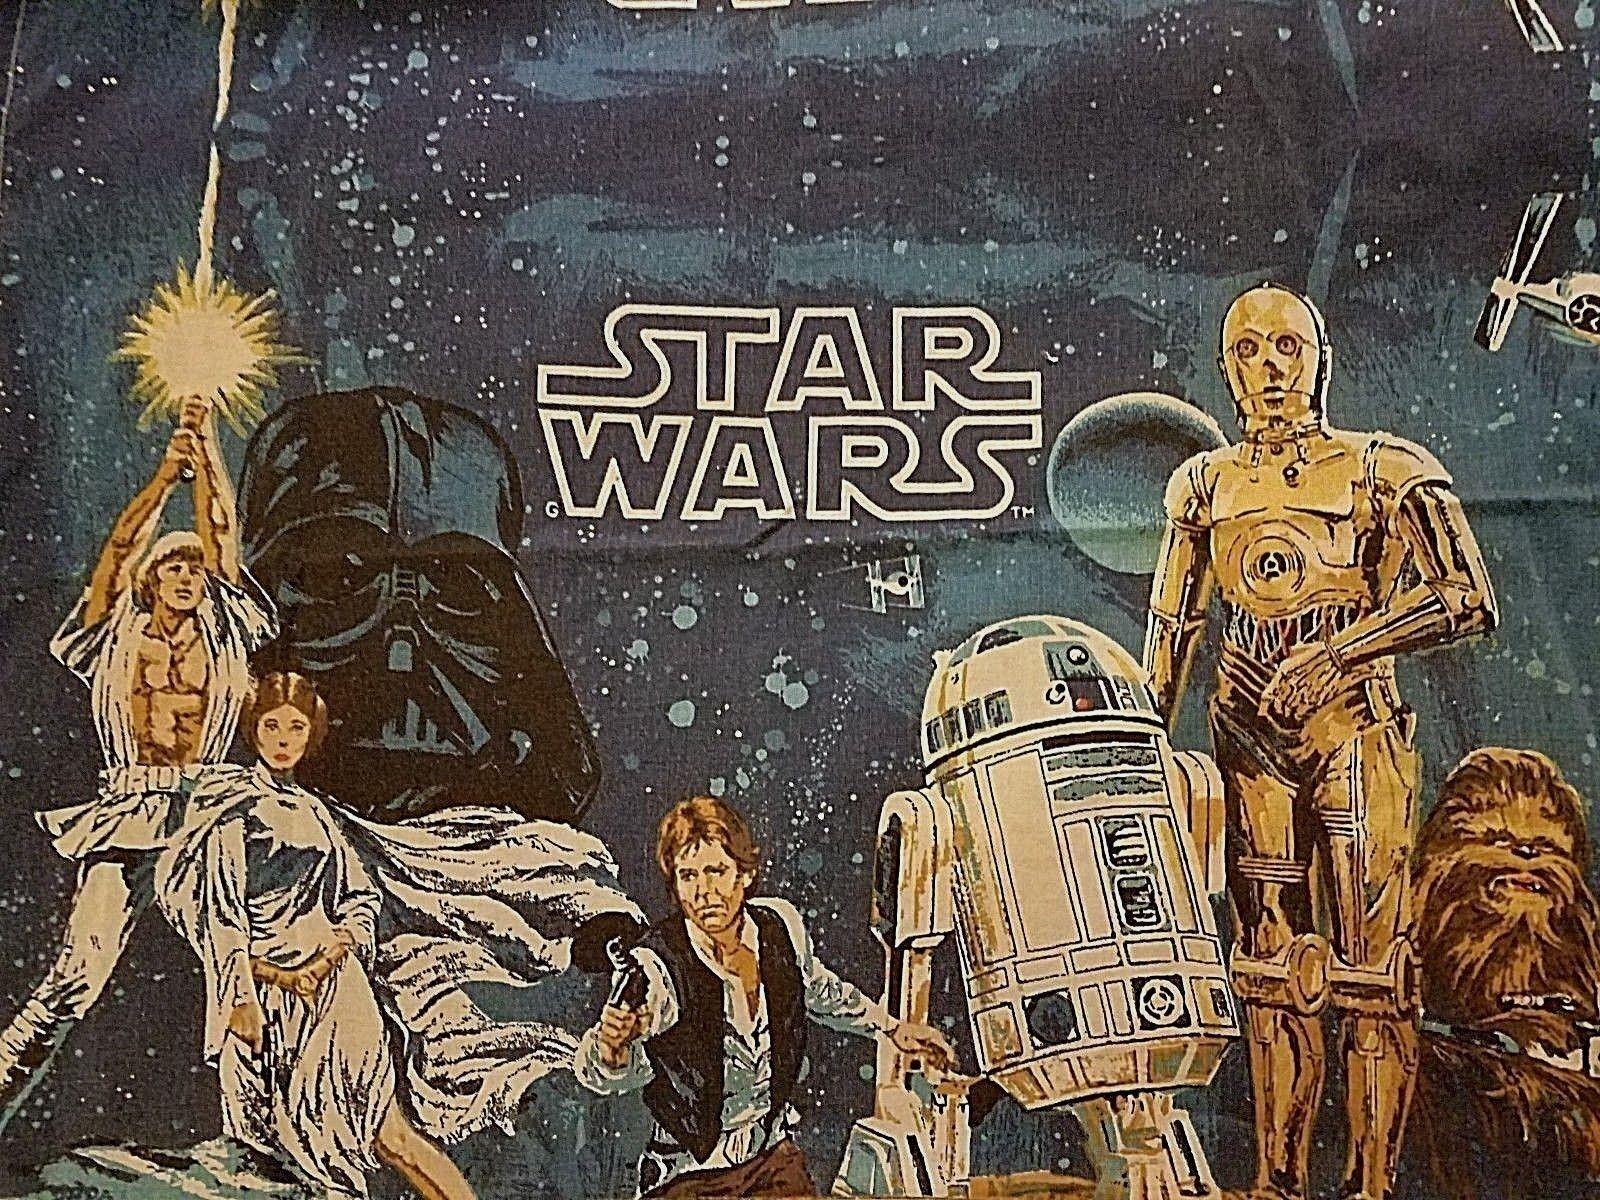 Star Wars Original Twin sheet Sets, 2 ensembles (1977)